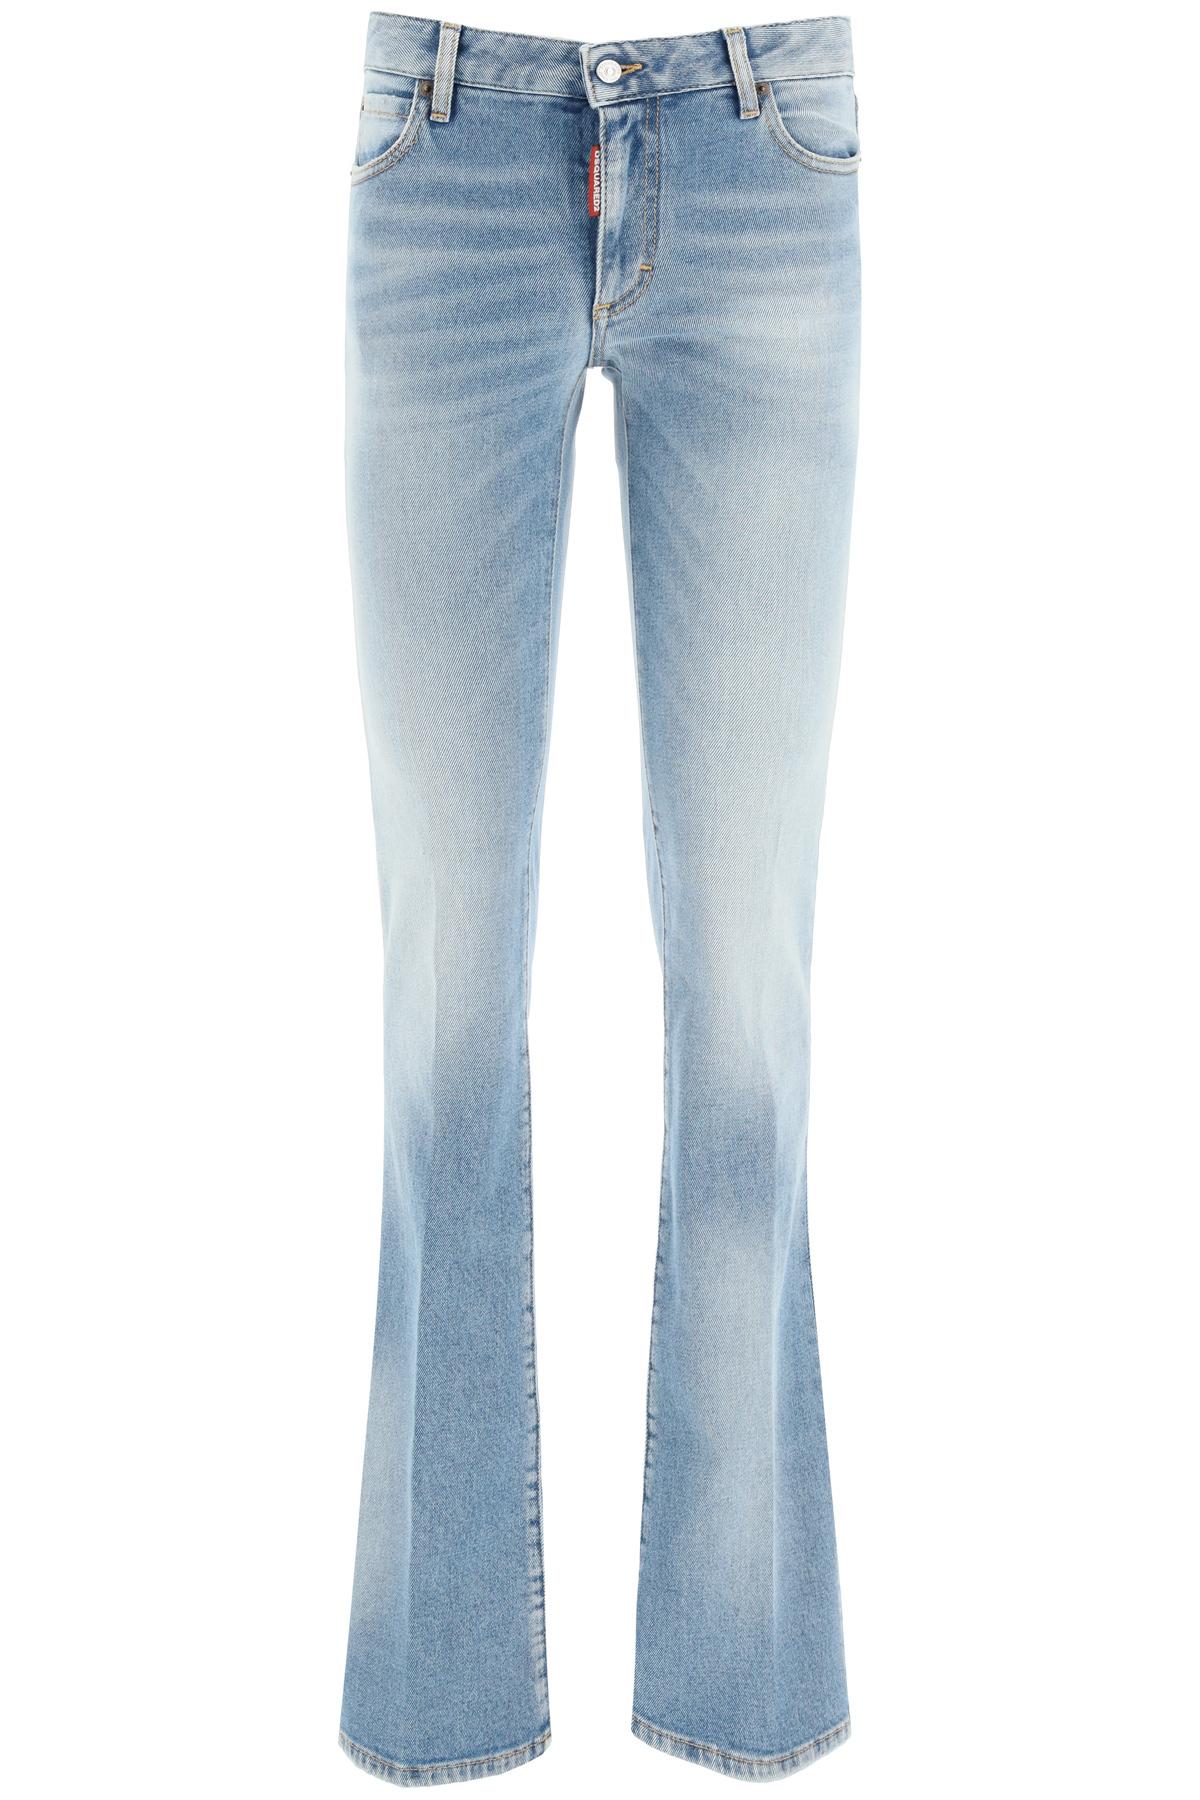 Dsquared2 jeans medium waist flare